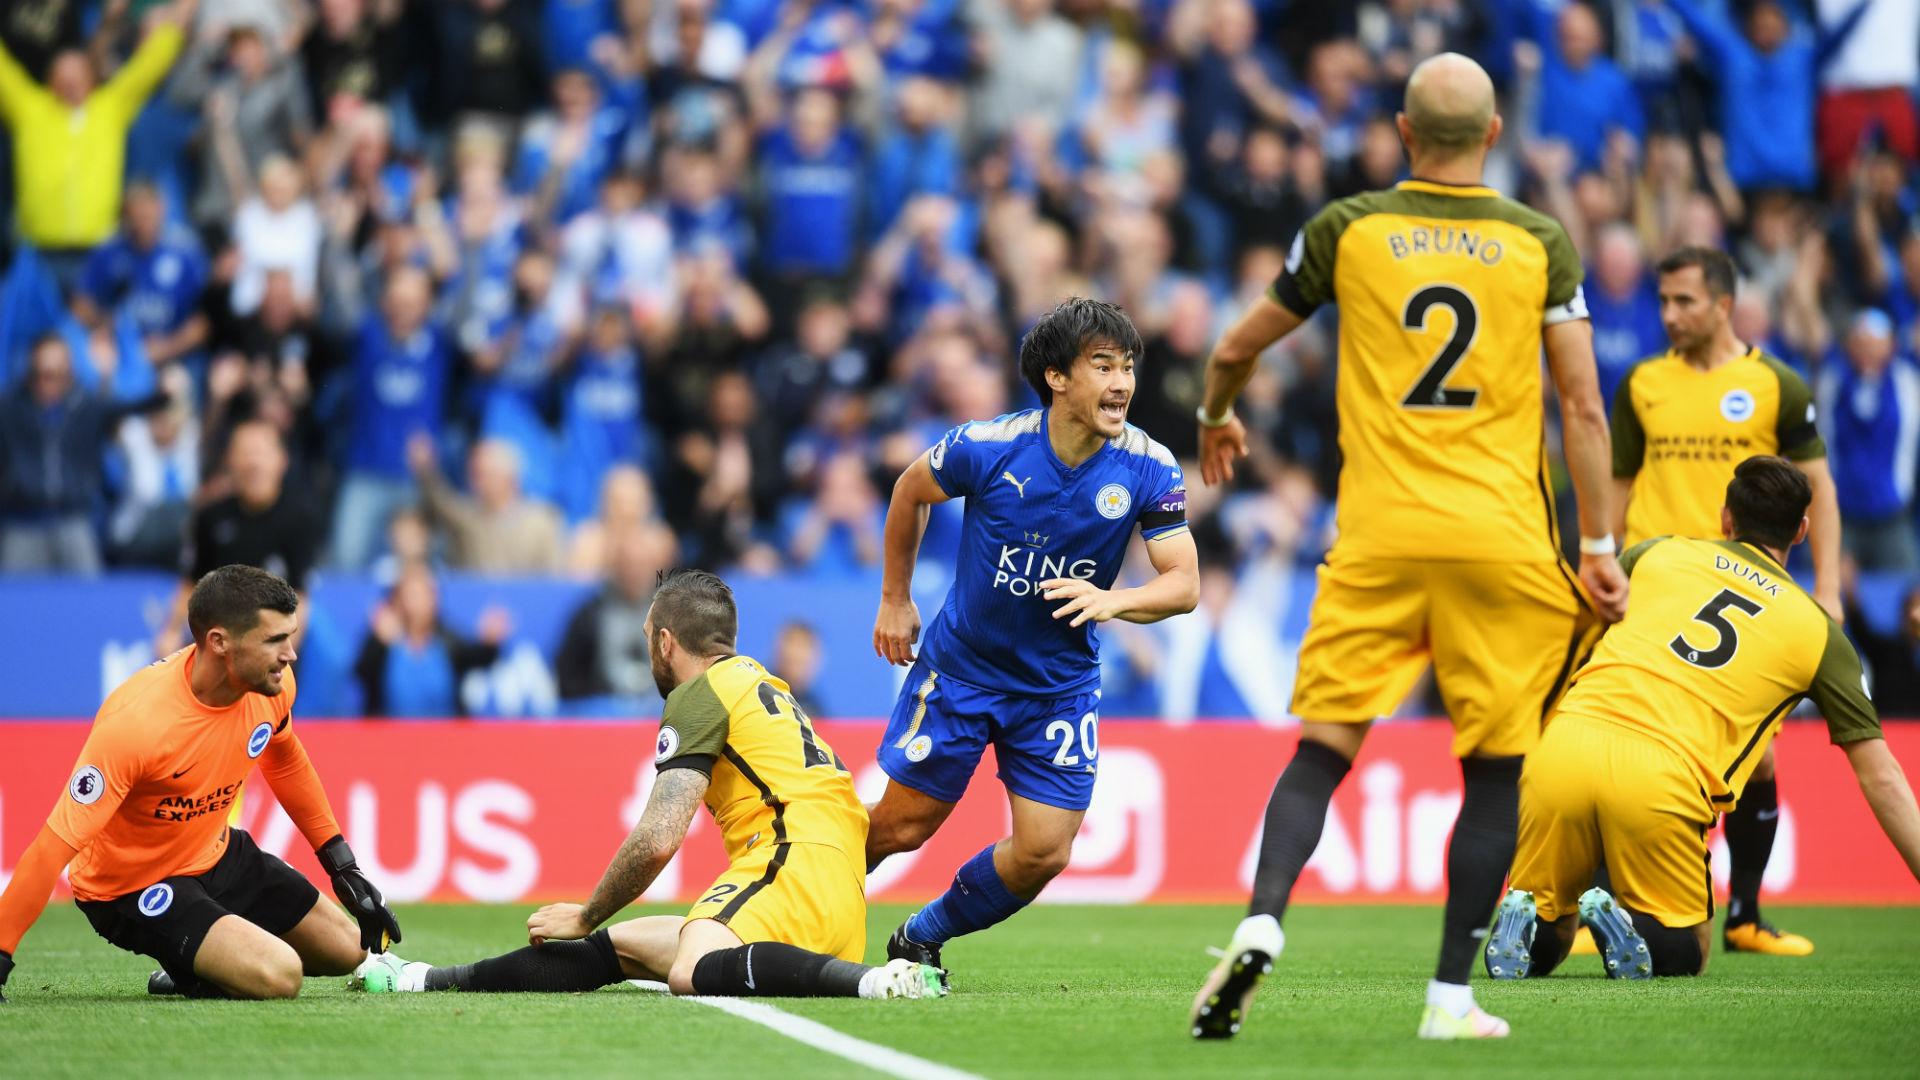 Leicester City Vs Brighton And Hove Albion